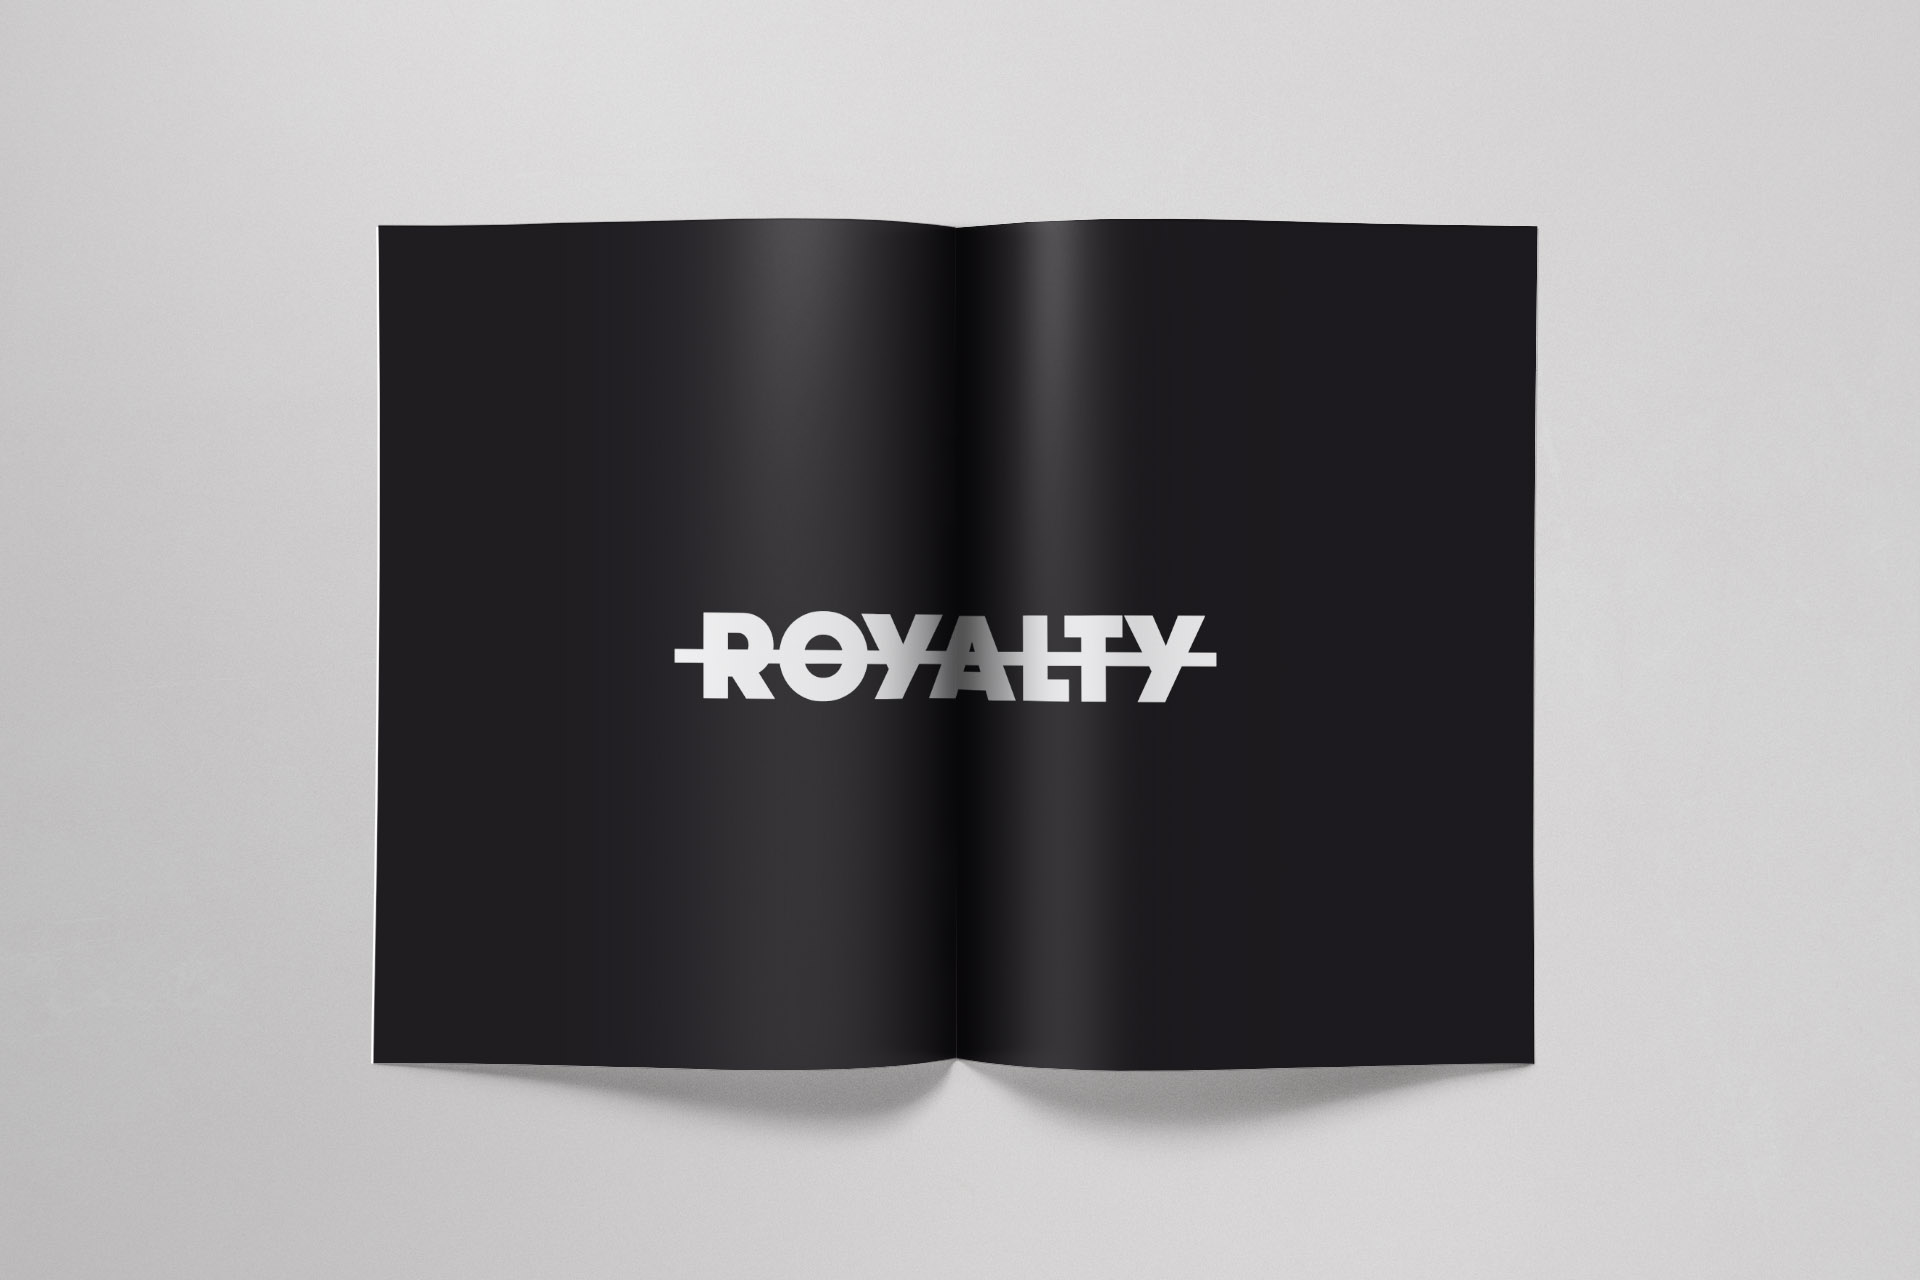 pb-brand-magSpread-royaltyFree4